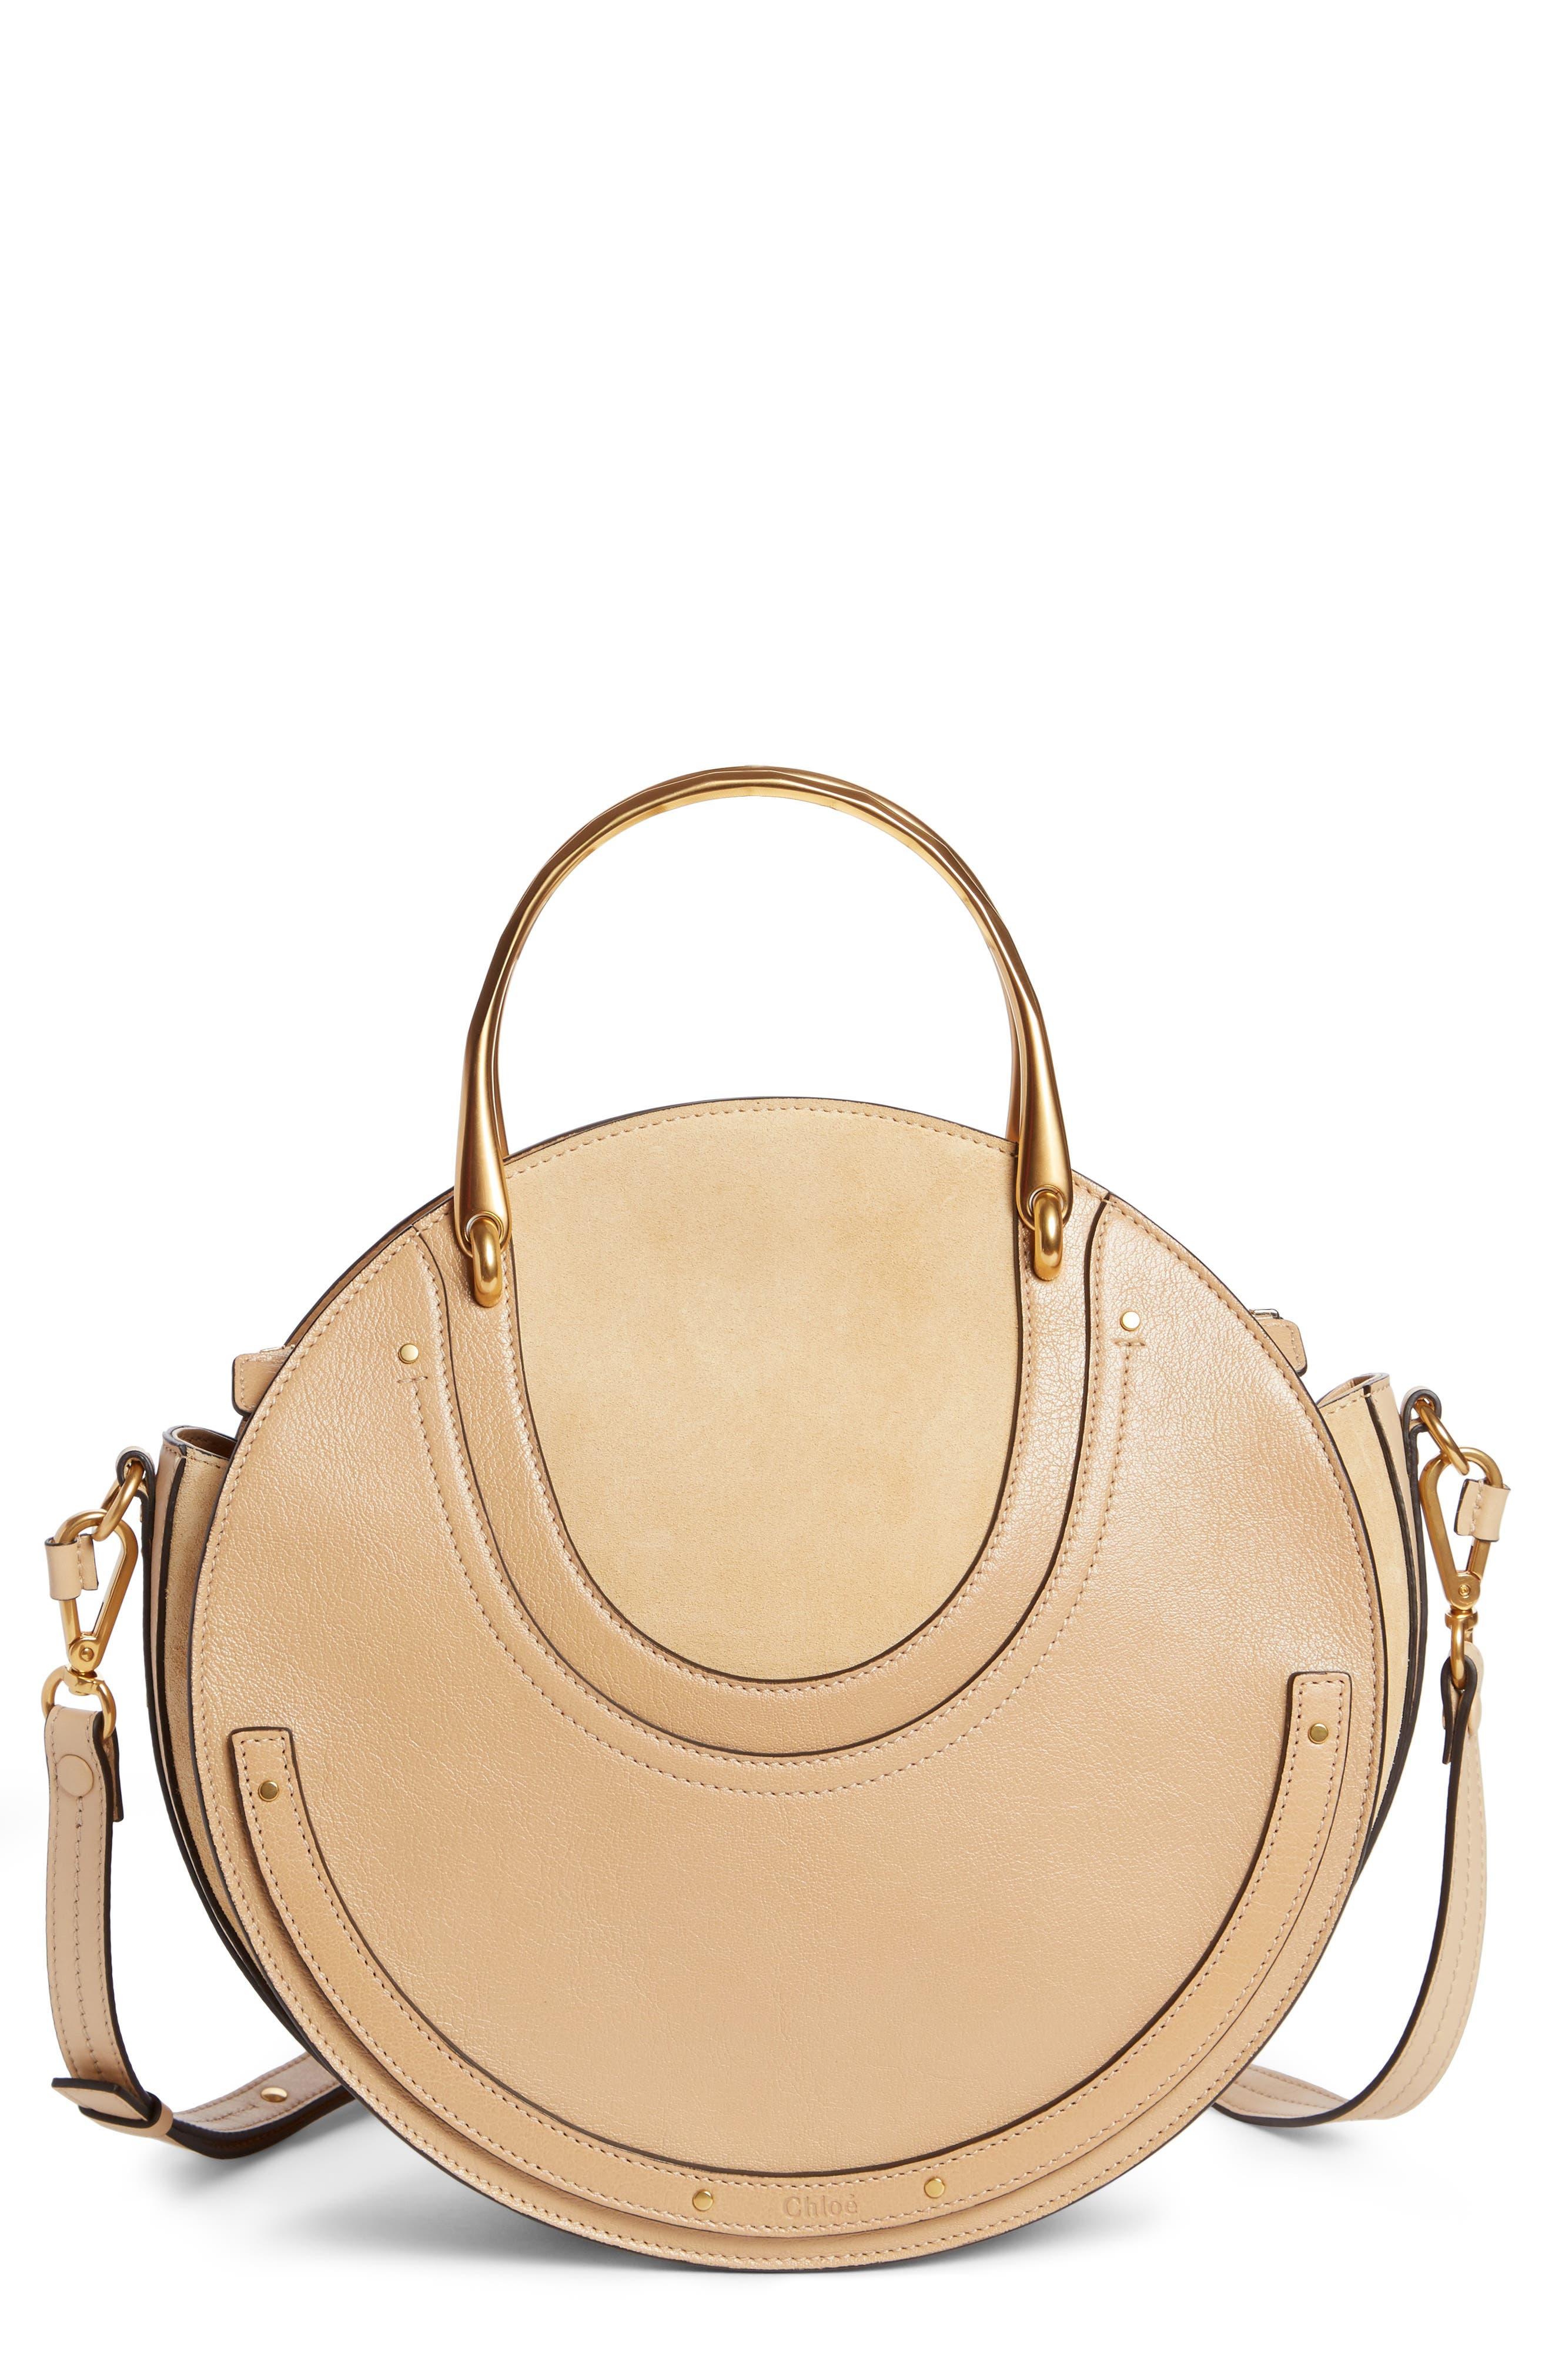 Main Image - Chloé Small Pixie Maxi Leather Satchel